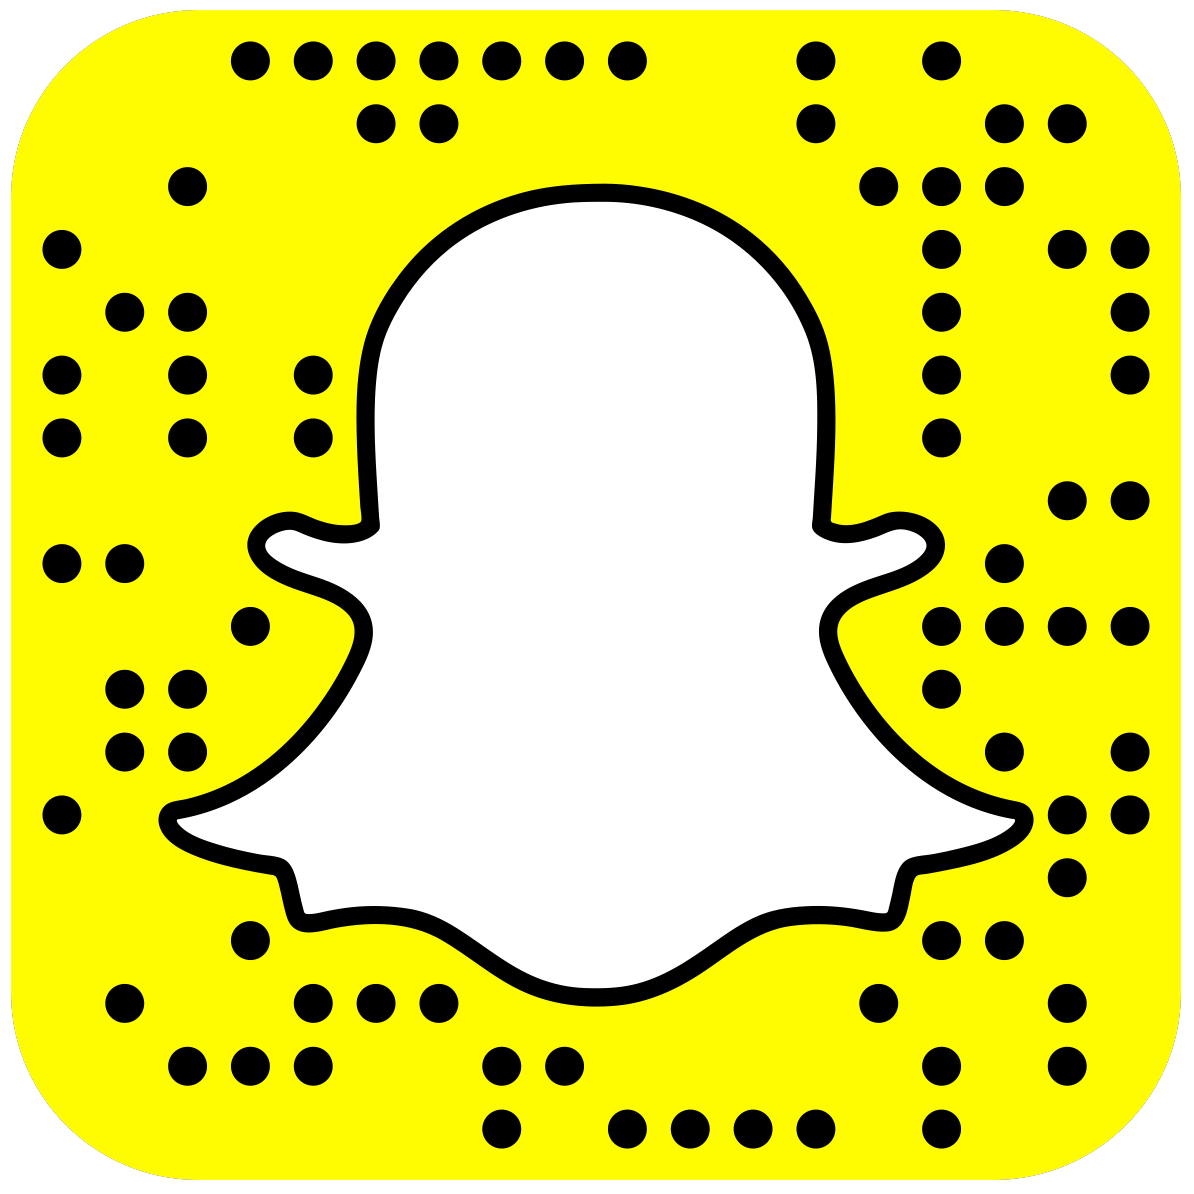 Candice Patton Snapchat username